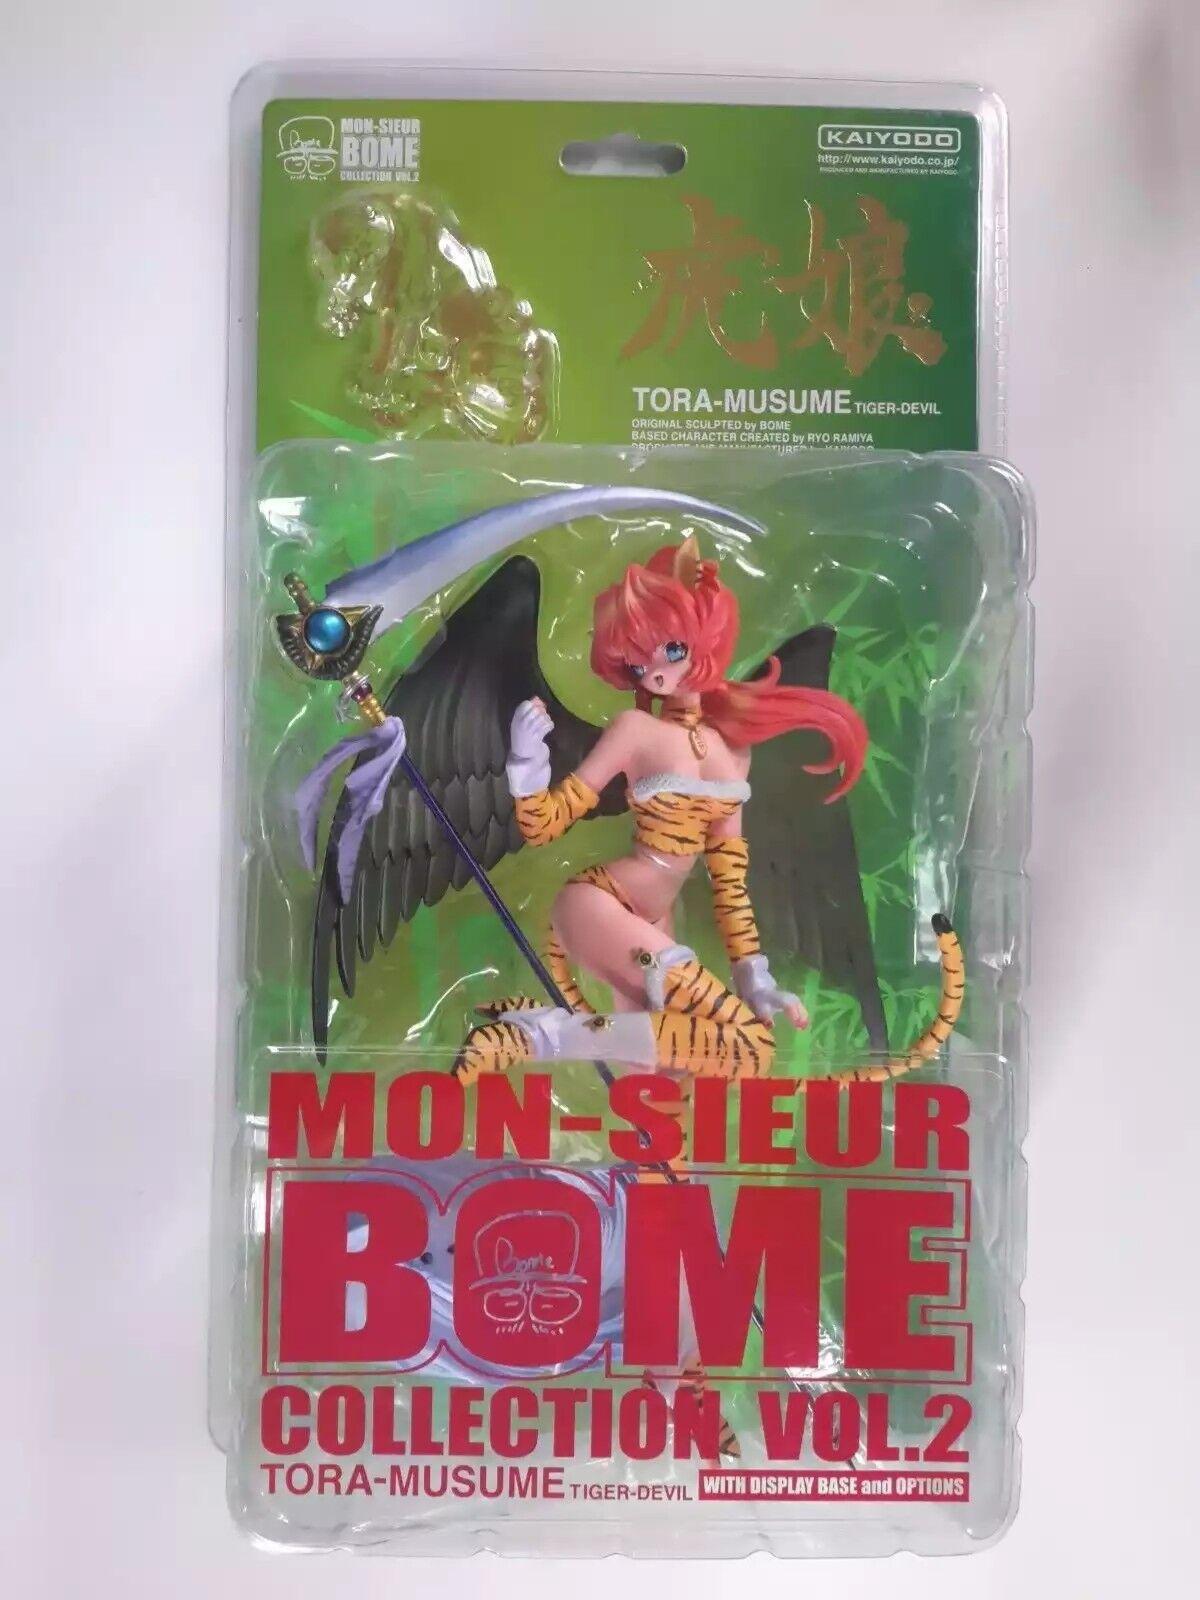 SEXY Pin up Girl FIGURE MON-SIEUR MON-SIEUR MON-SIEUR BOME COLLECTION VOL 2 TORA-MUSUME TIGER DEVIL c55743